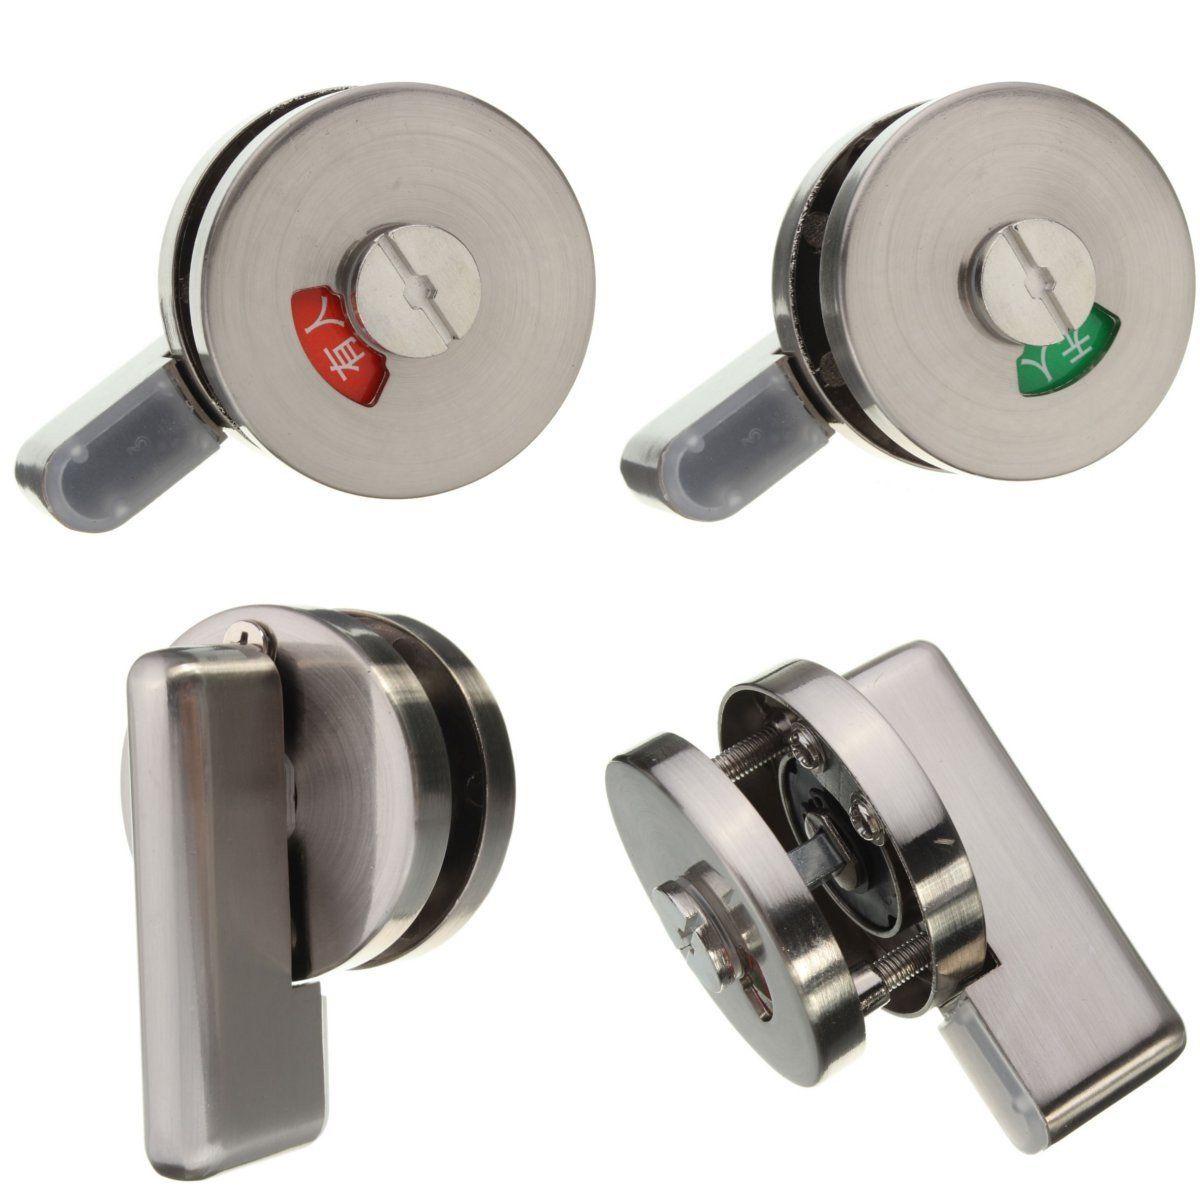 Us 6 40 Stainless Steel Bathroom Toilet Door Indicator Turn Release Lock Latch Bolt Stainless Steel Bathroom Toilet Door Indicator Turn Release Lock